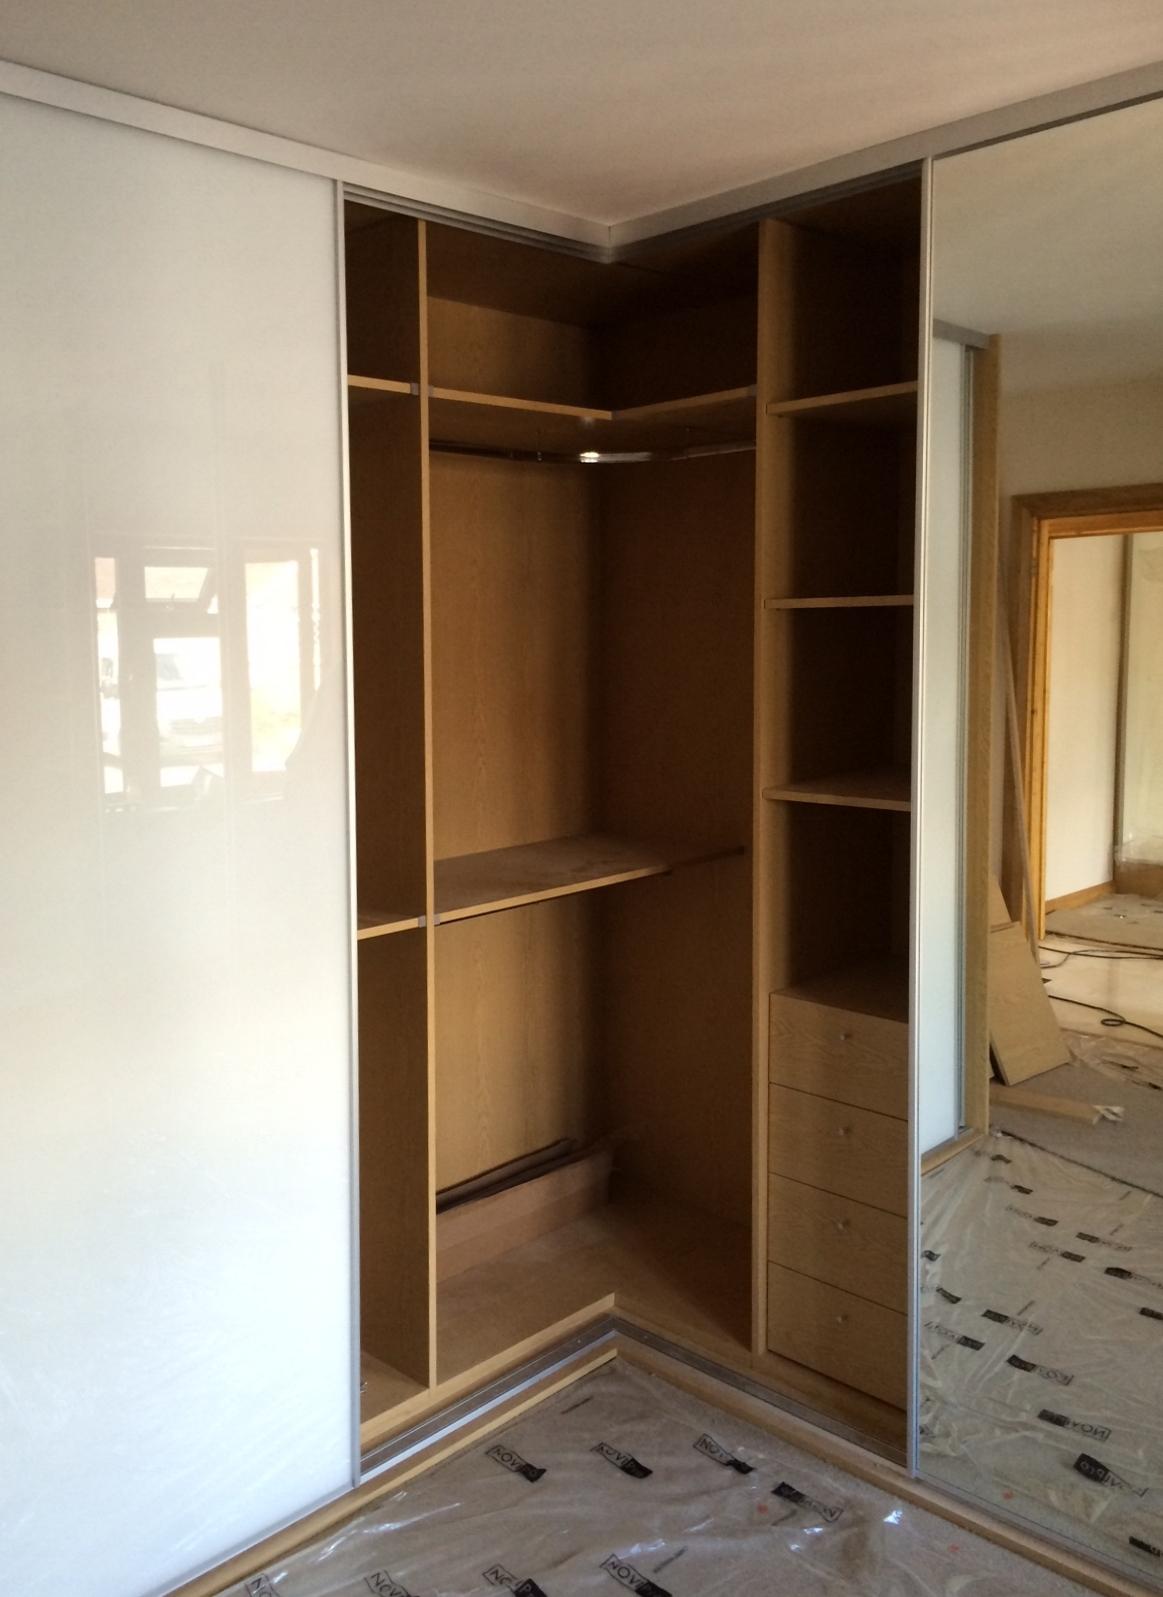 Sliding Wardrobe Doors And Wardrobe Interiors Corner L Shaped Inside Curved Wardrobe Doors (View 5 of 15)